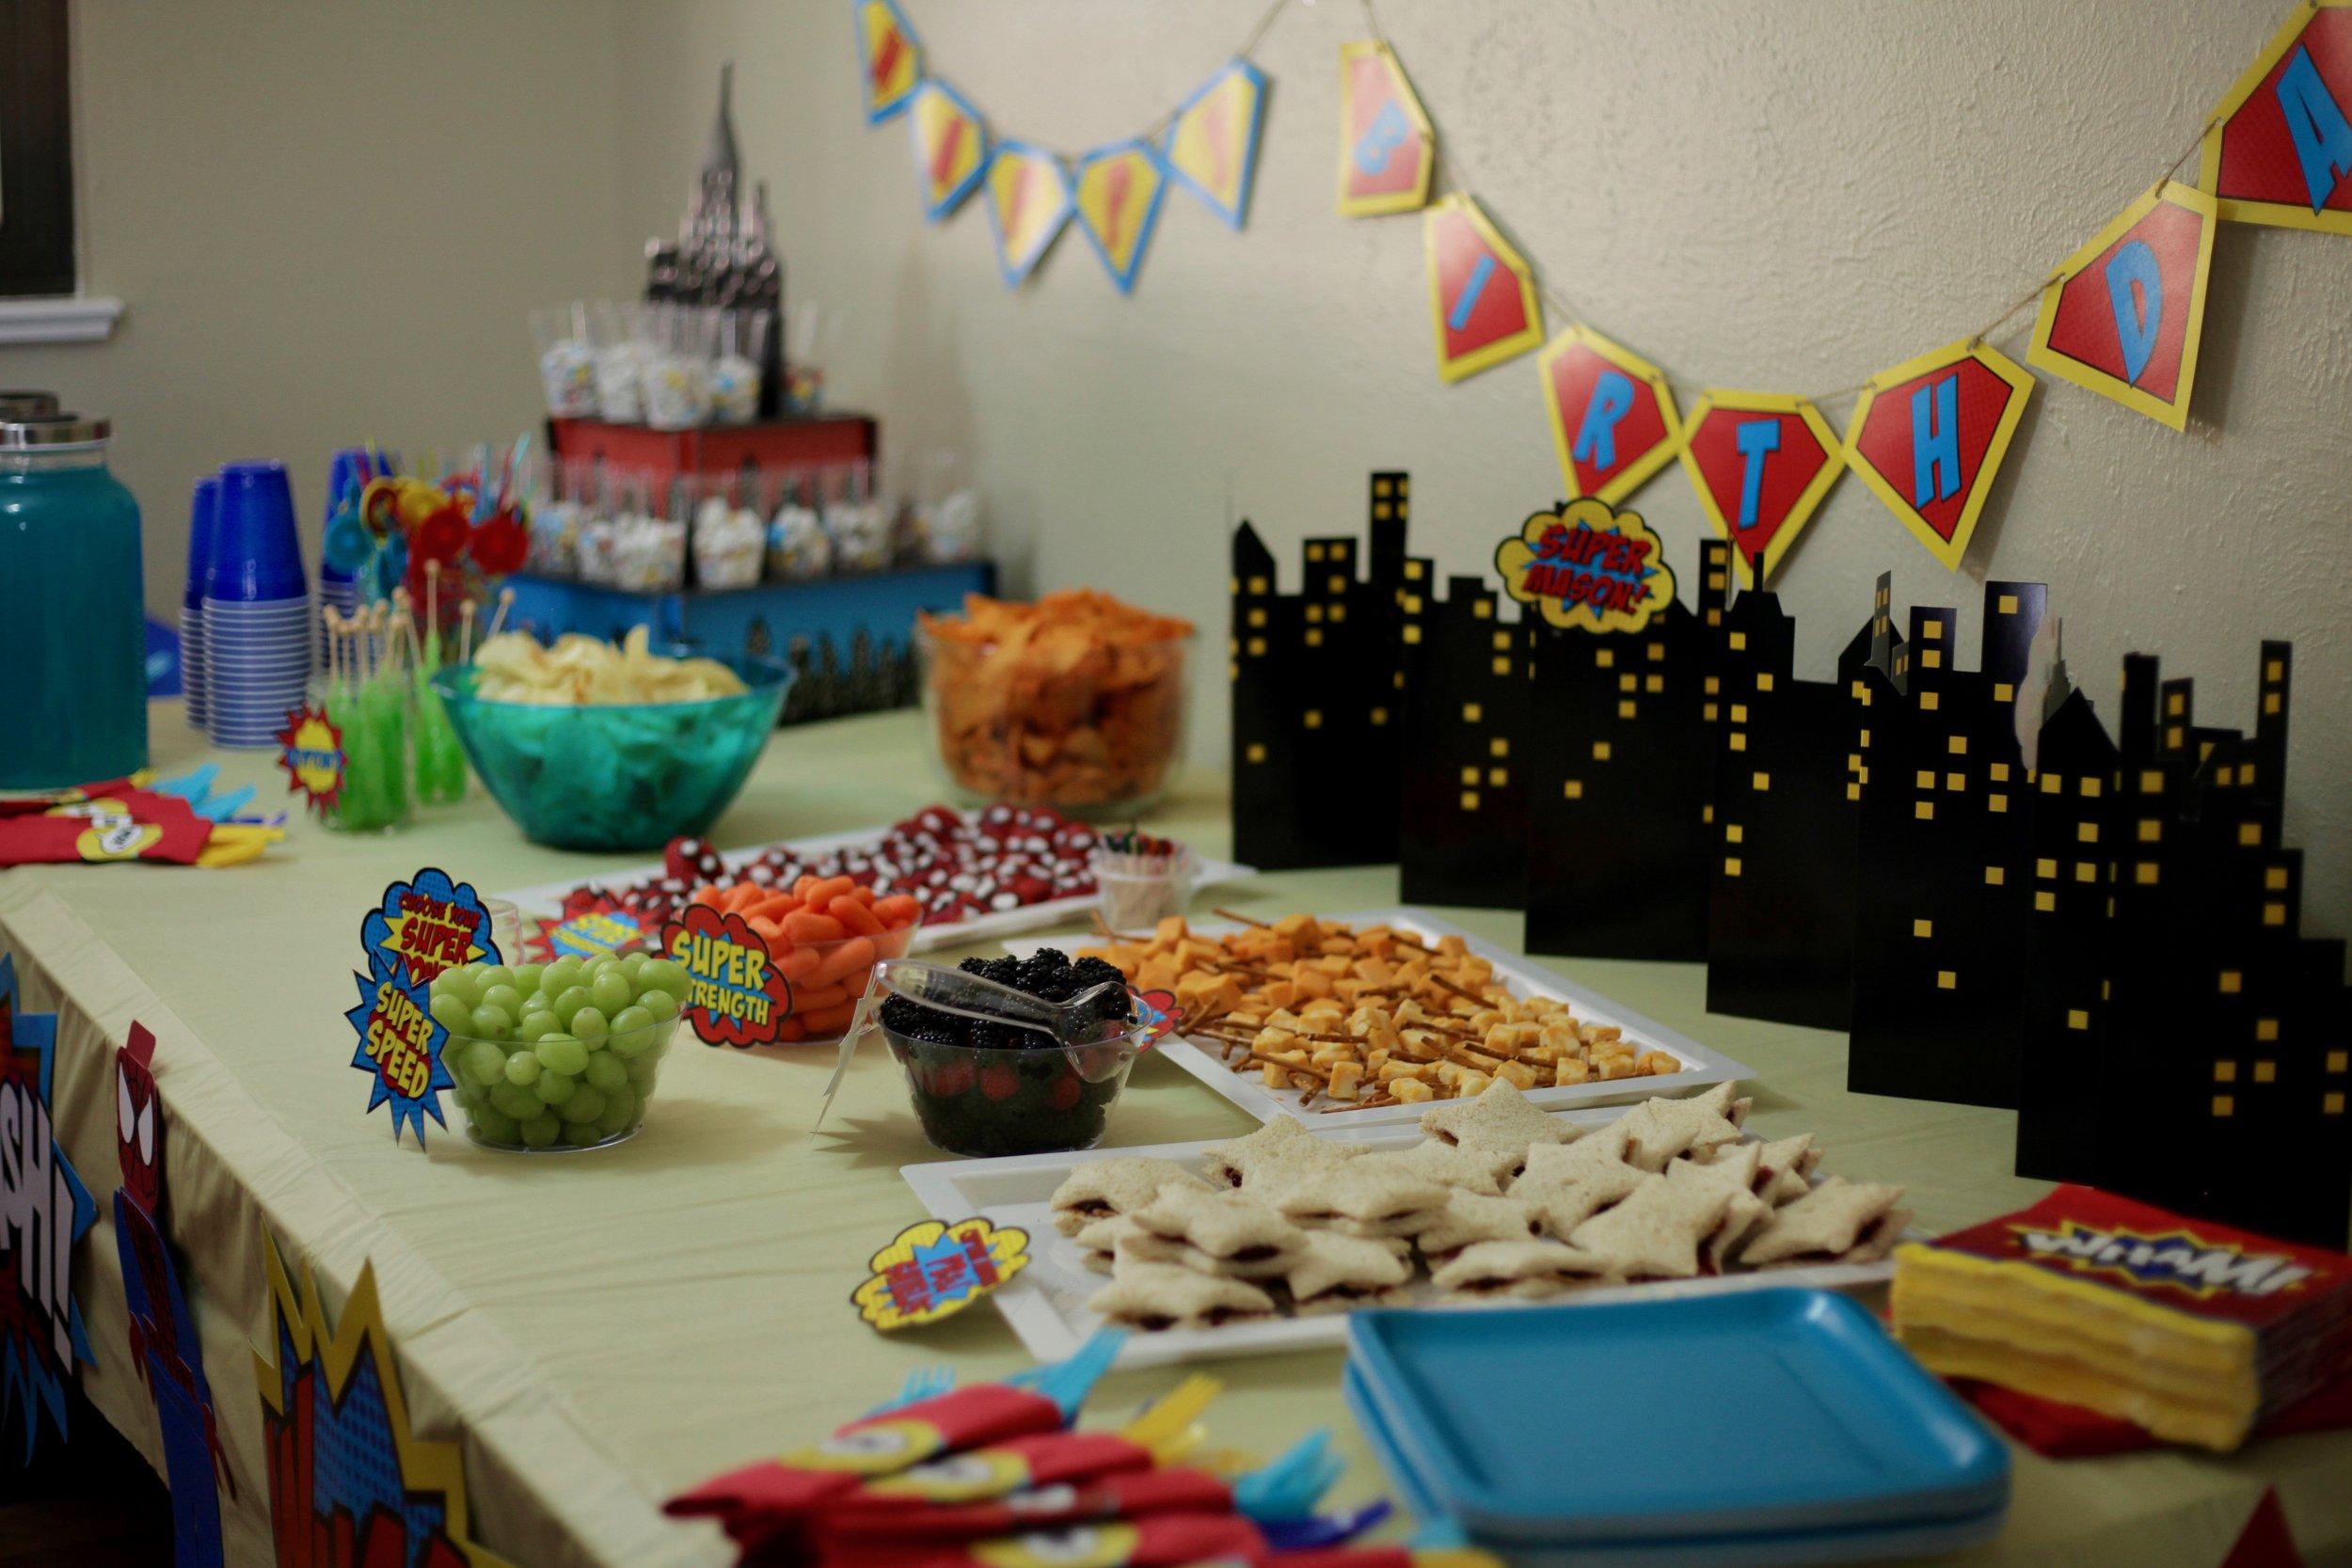 "<img src =""superheroparty.jpg"" alt = ""superhero-birthday-party-food-and-decor"">"